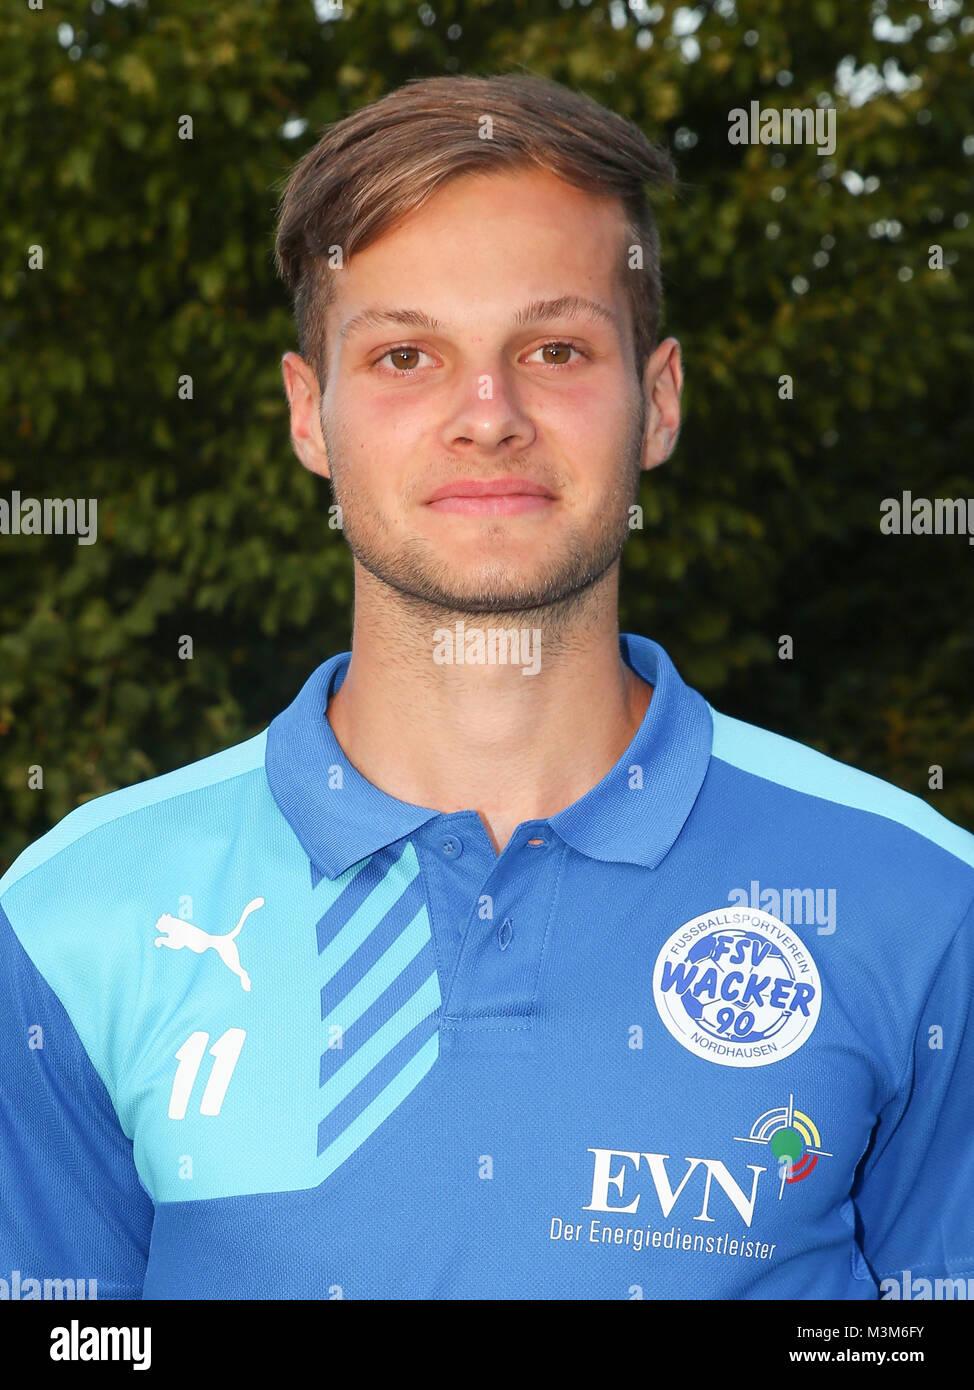 Kader FSV Wacker 90 Nordhausen  - NOFV-Regionalliga Nordost, Saison 2016/17 - Stock Image